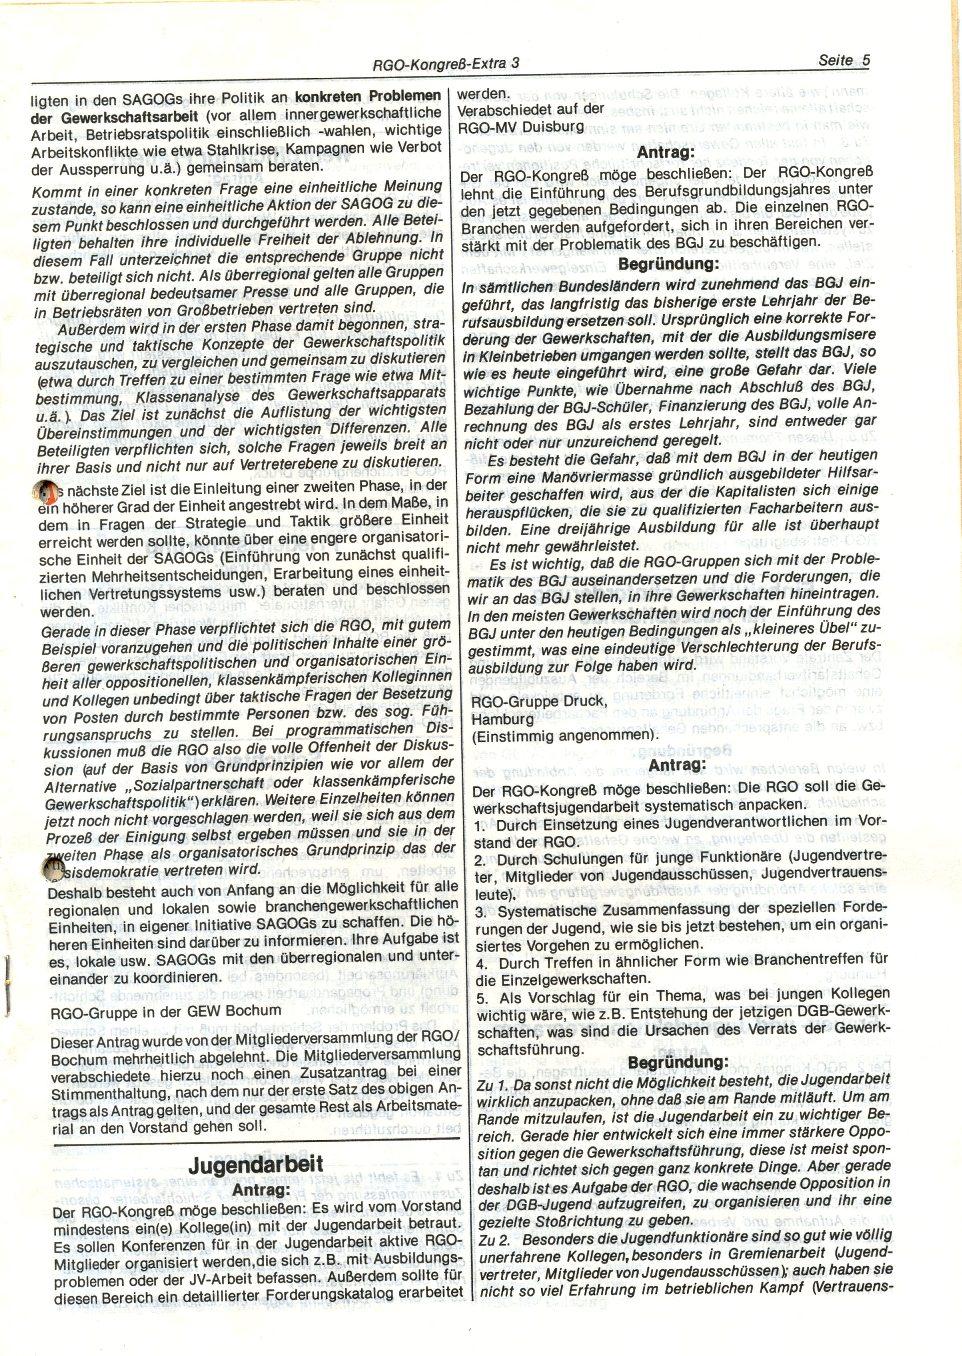 RGO_Kongress_Extra_1981_3_05